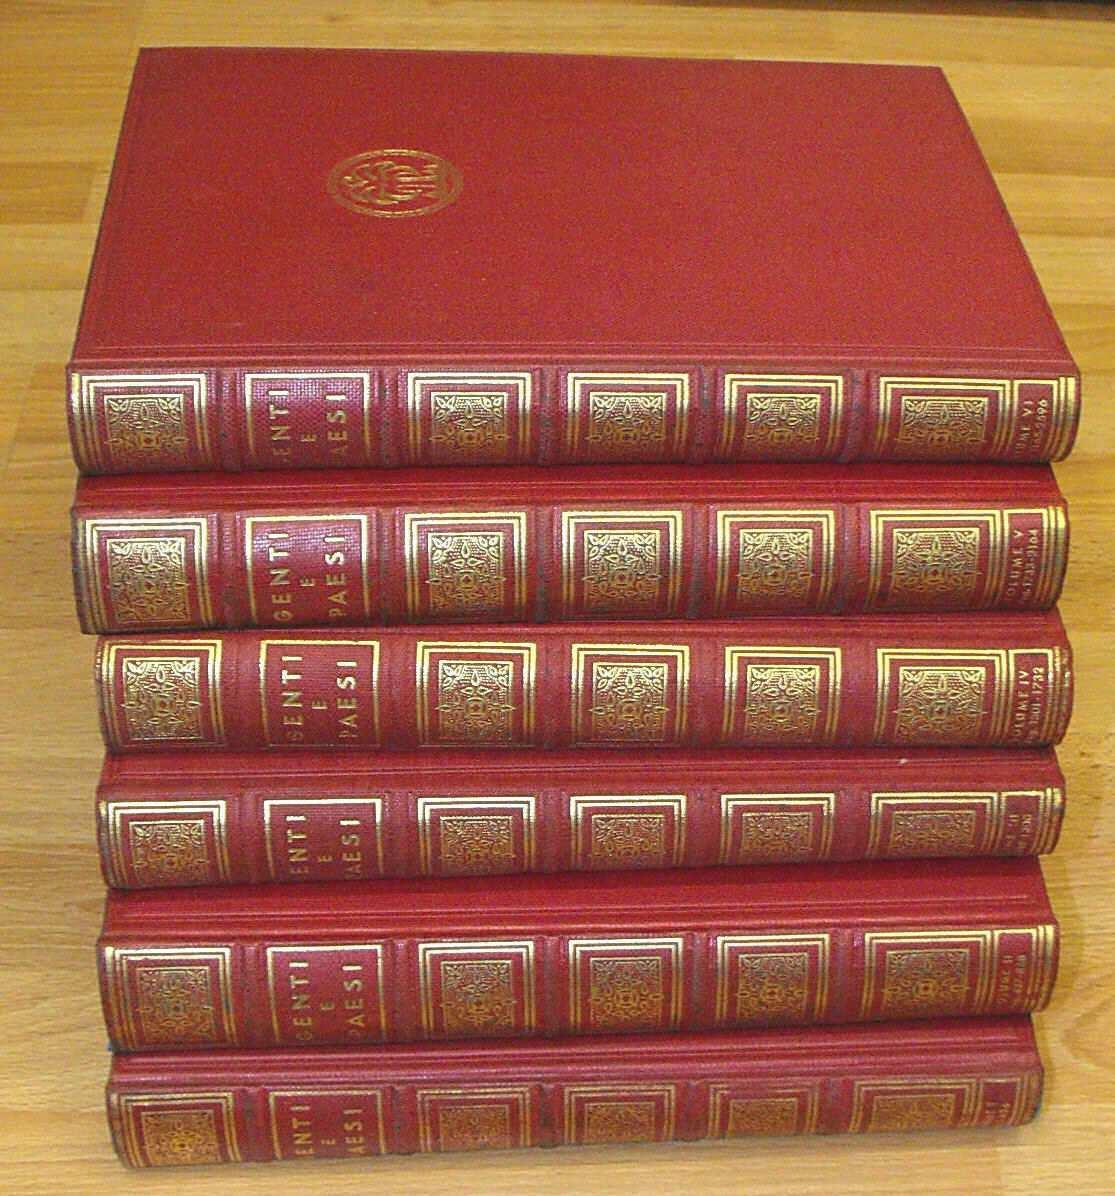 GENTI E PAESI:  MERAVIGLIE E CURIOSITA' DELLA TERRA (volumi I, II, III, IV, V e VI)